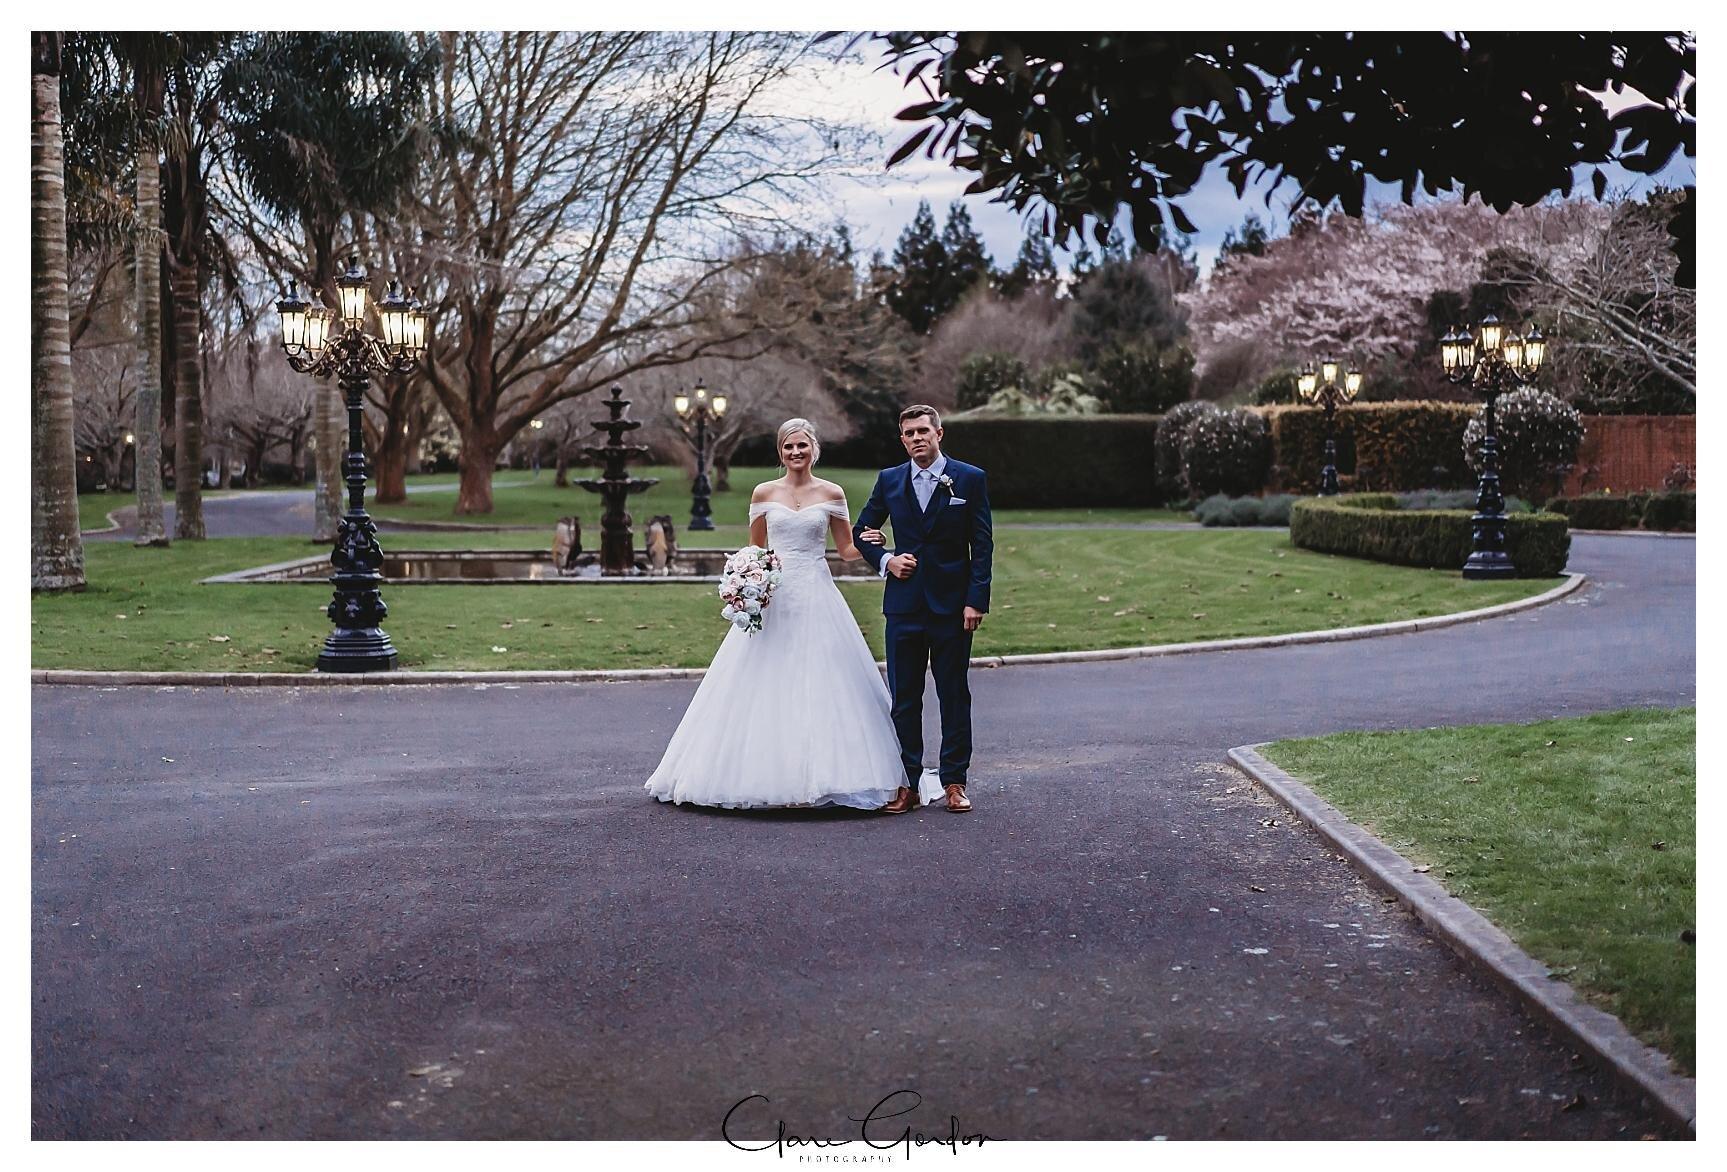 Henley-Hotel-Cherry-blossom-wedding-photos (77).jpg